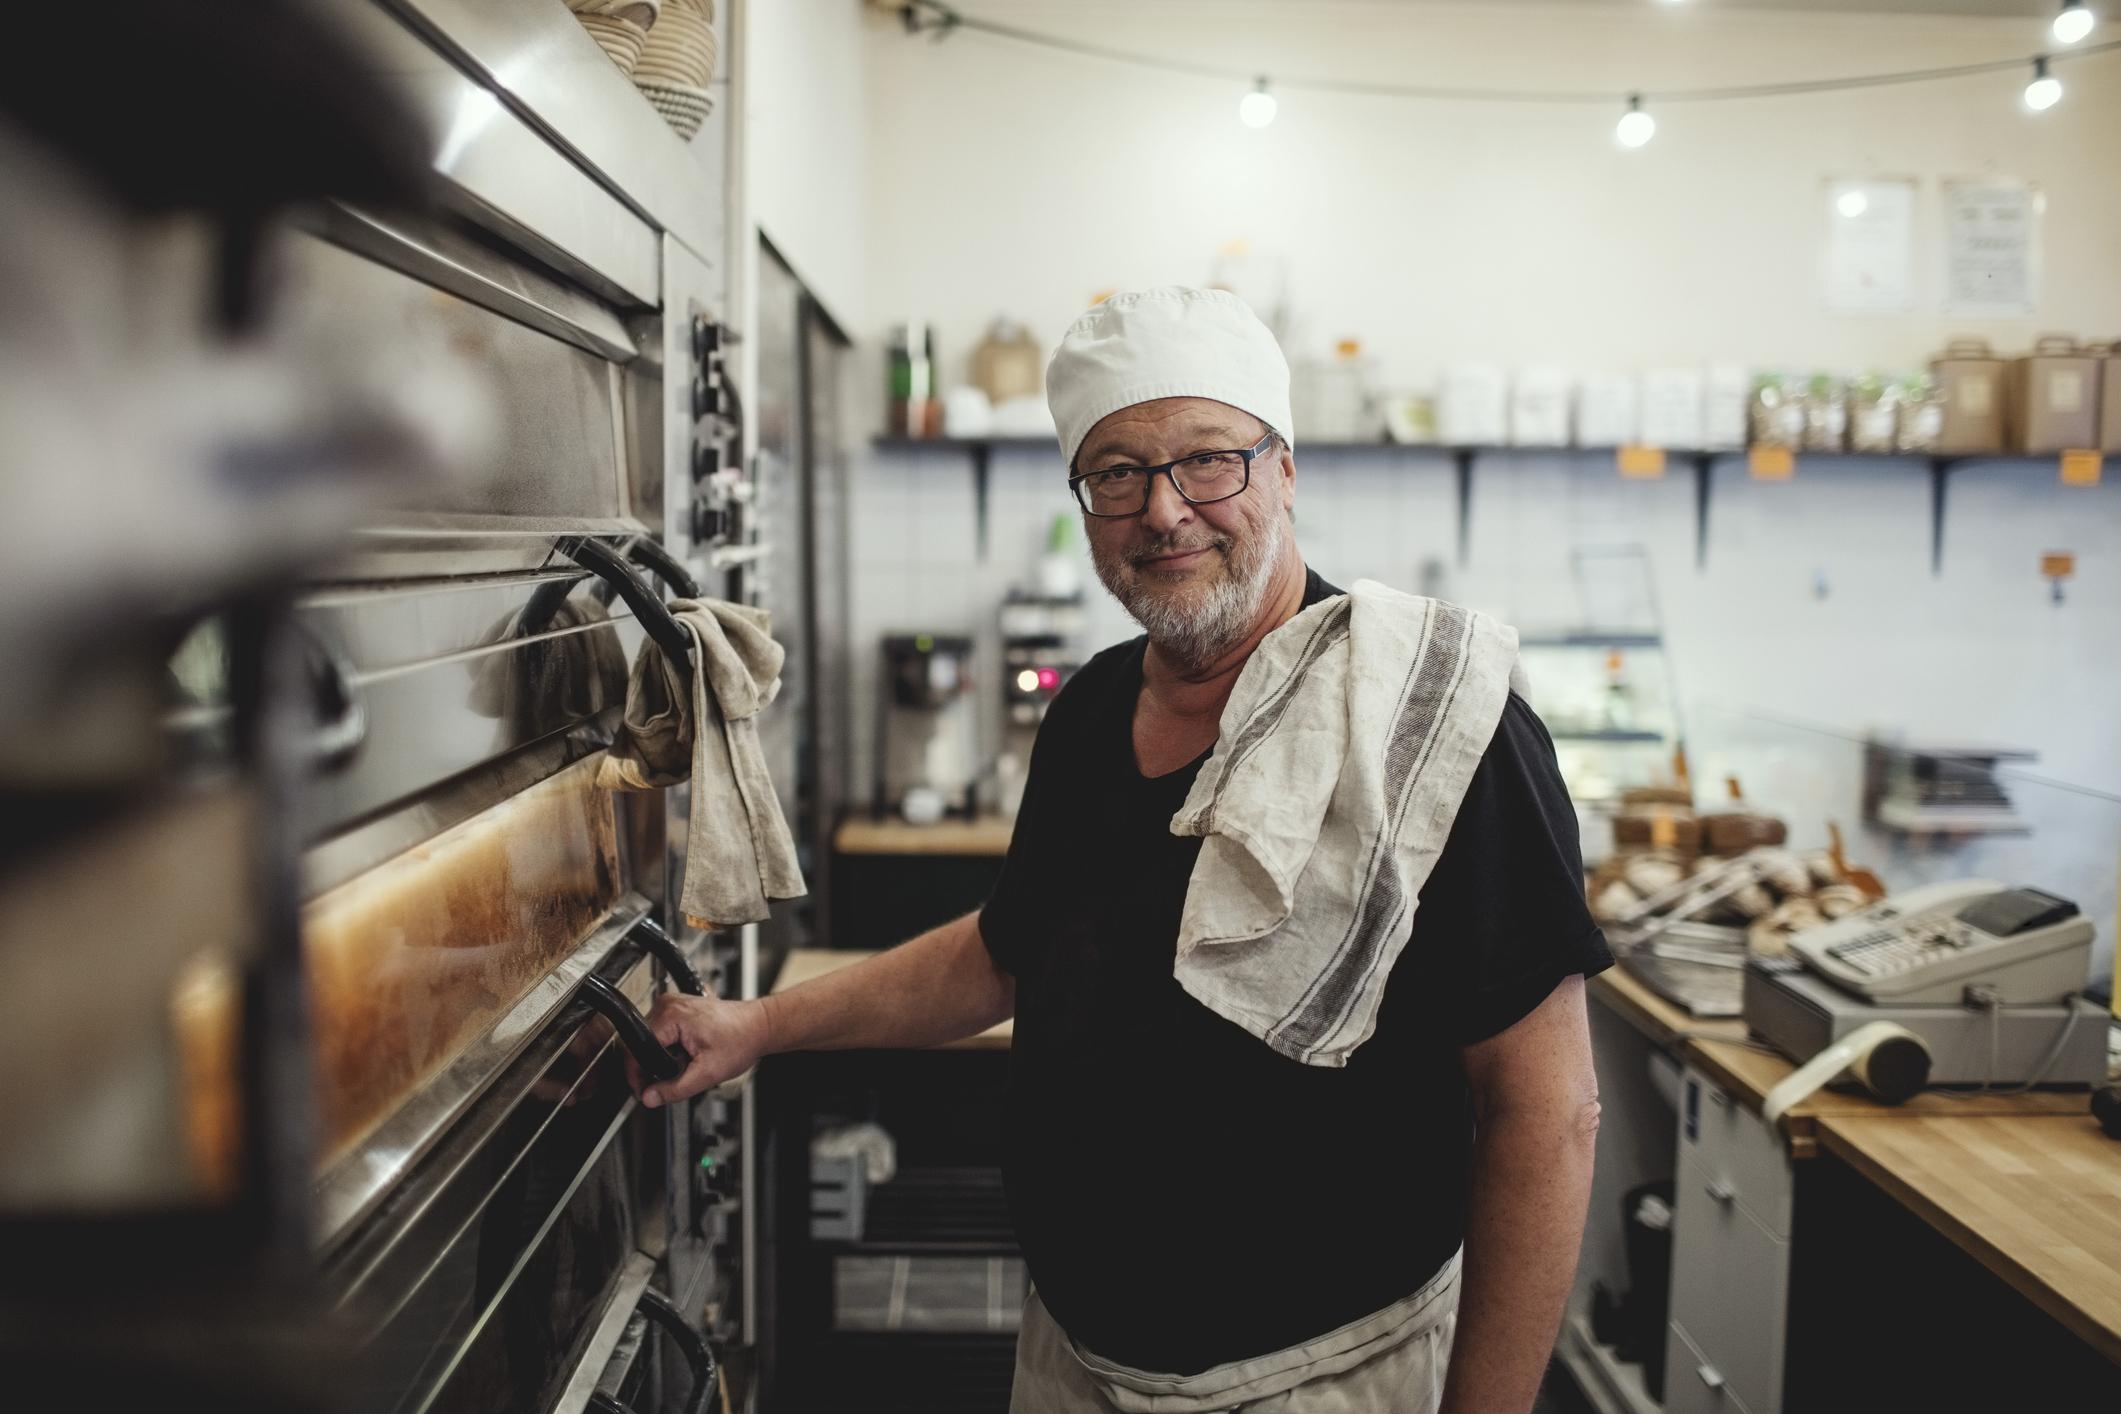 Portrait of senior baker standing by oven at bakery